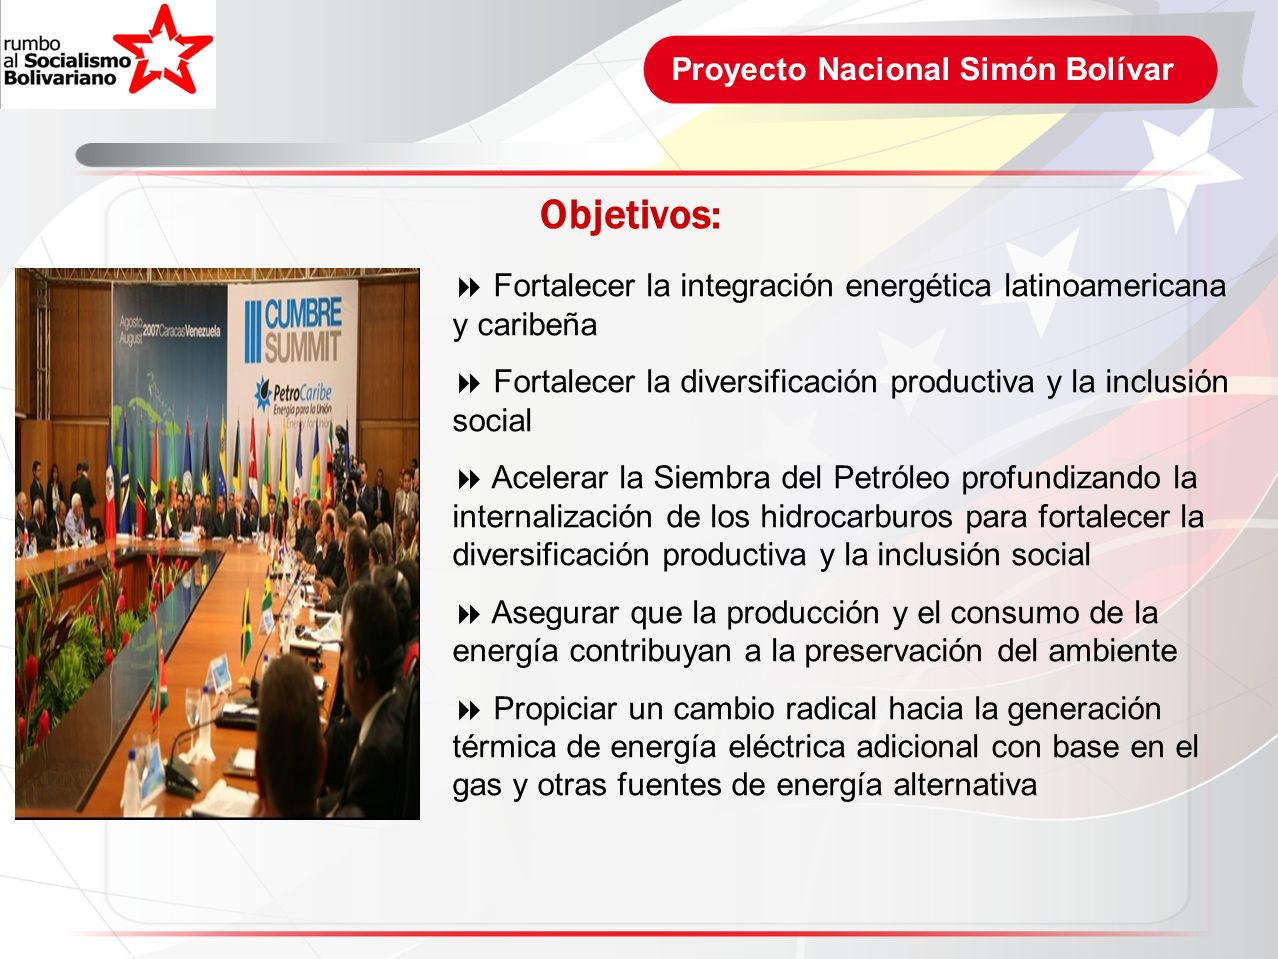 Objetivos: Proyecto Nacional Simón Bolívar